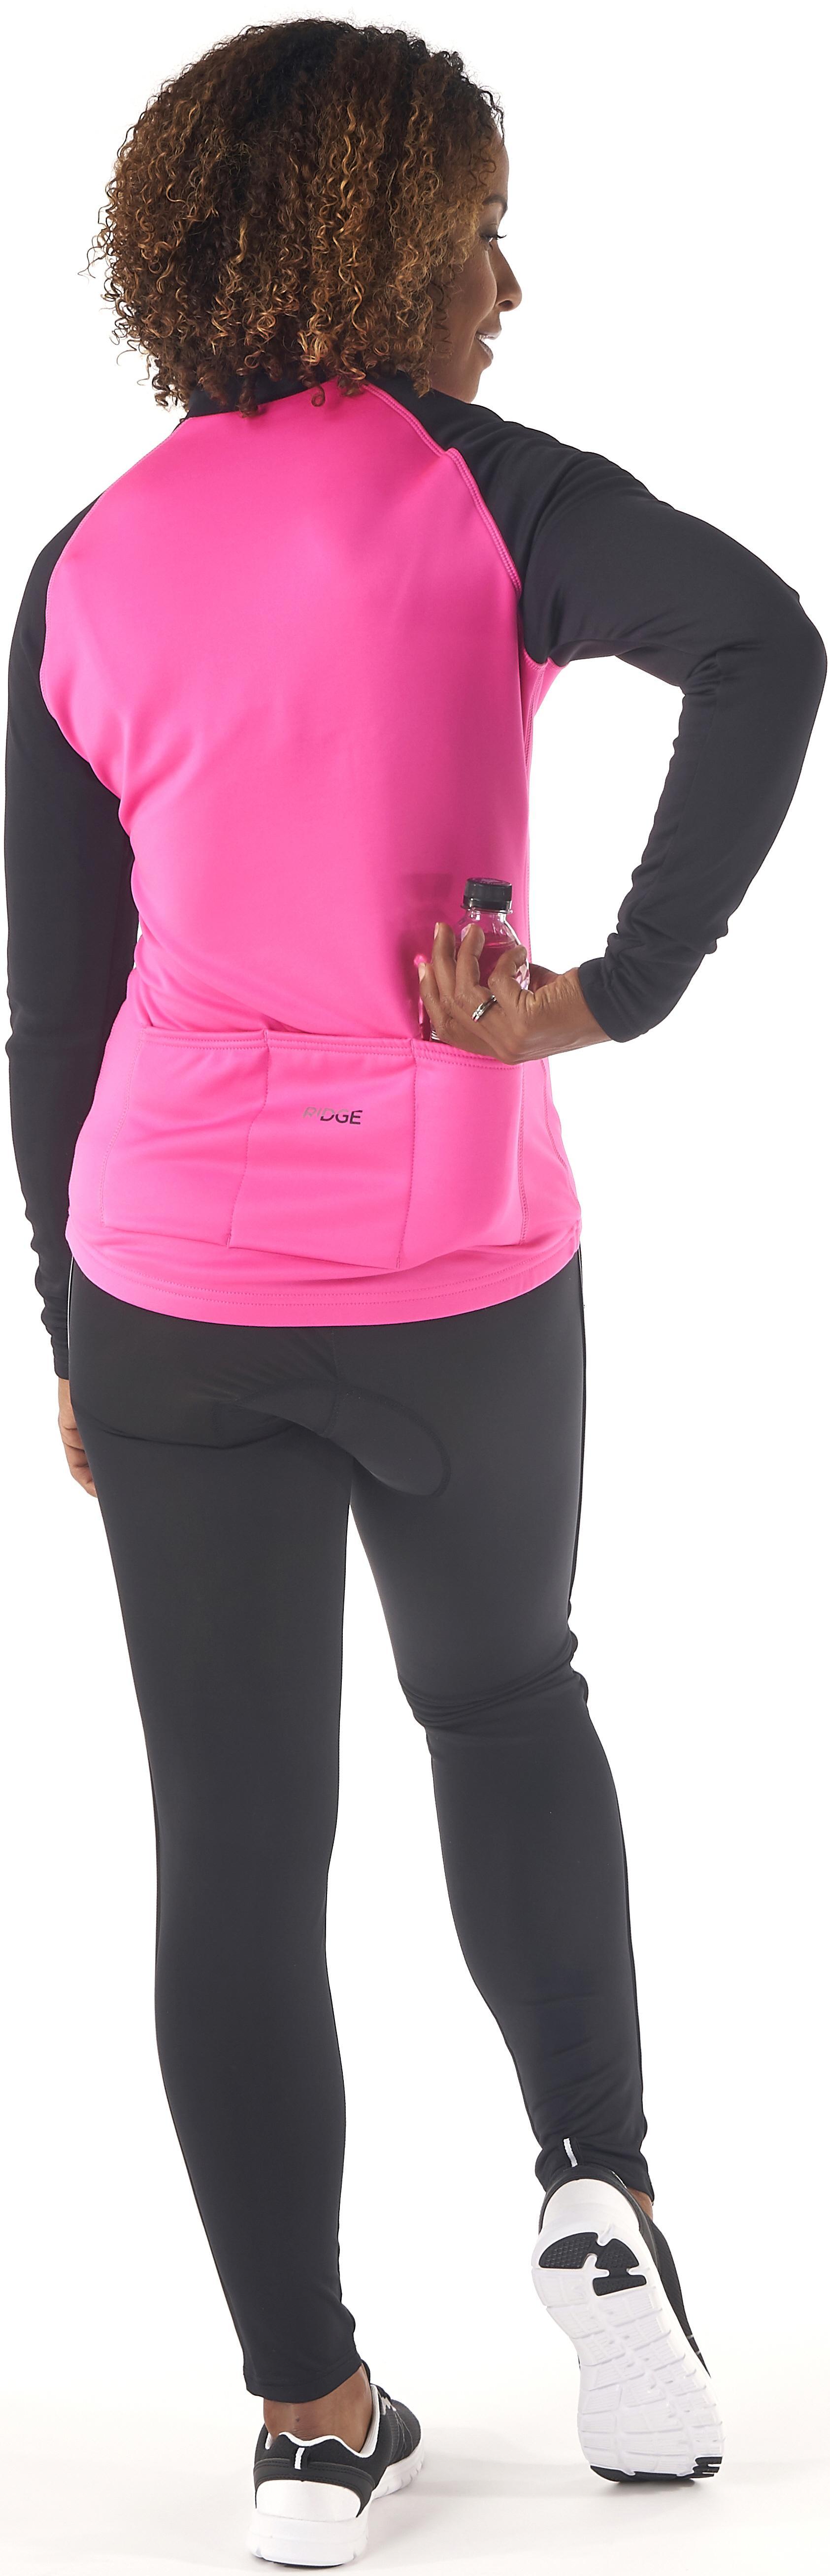 Ridge Womens Long Sleeve Half Zip Reflective Cycling Thermal Jersey ... f2a04ba37